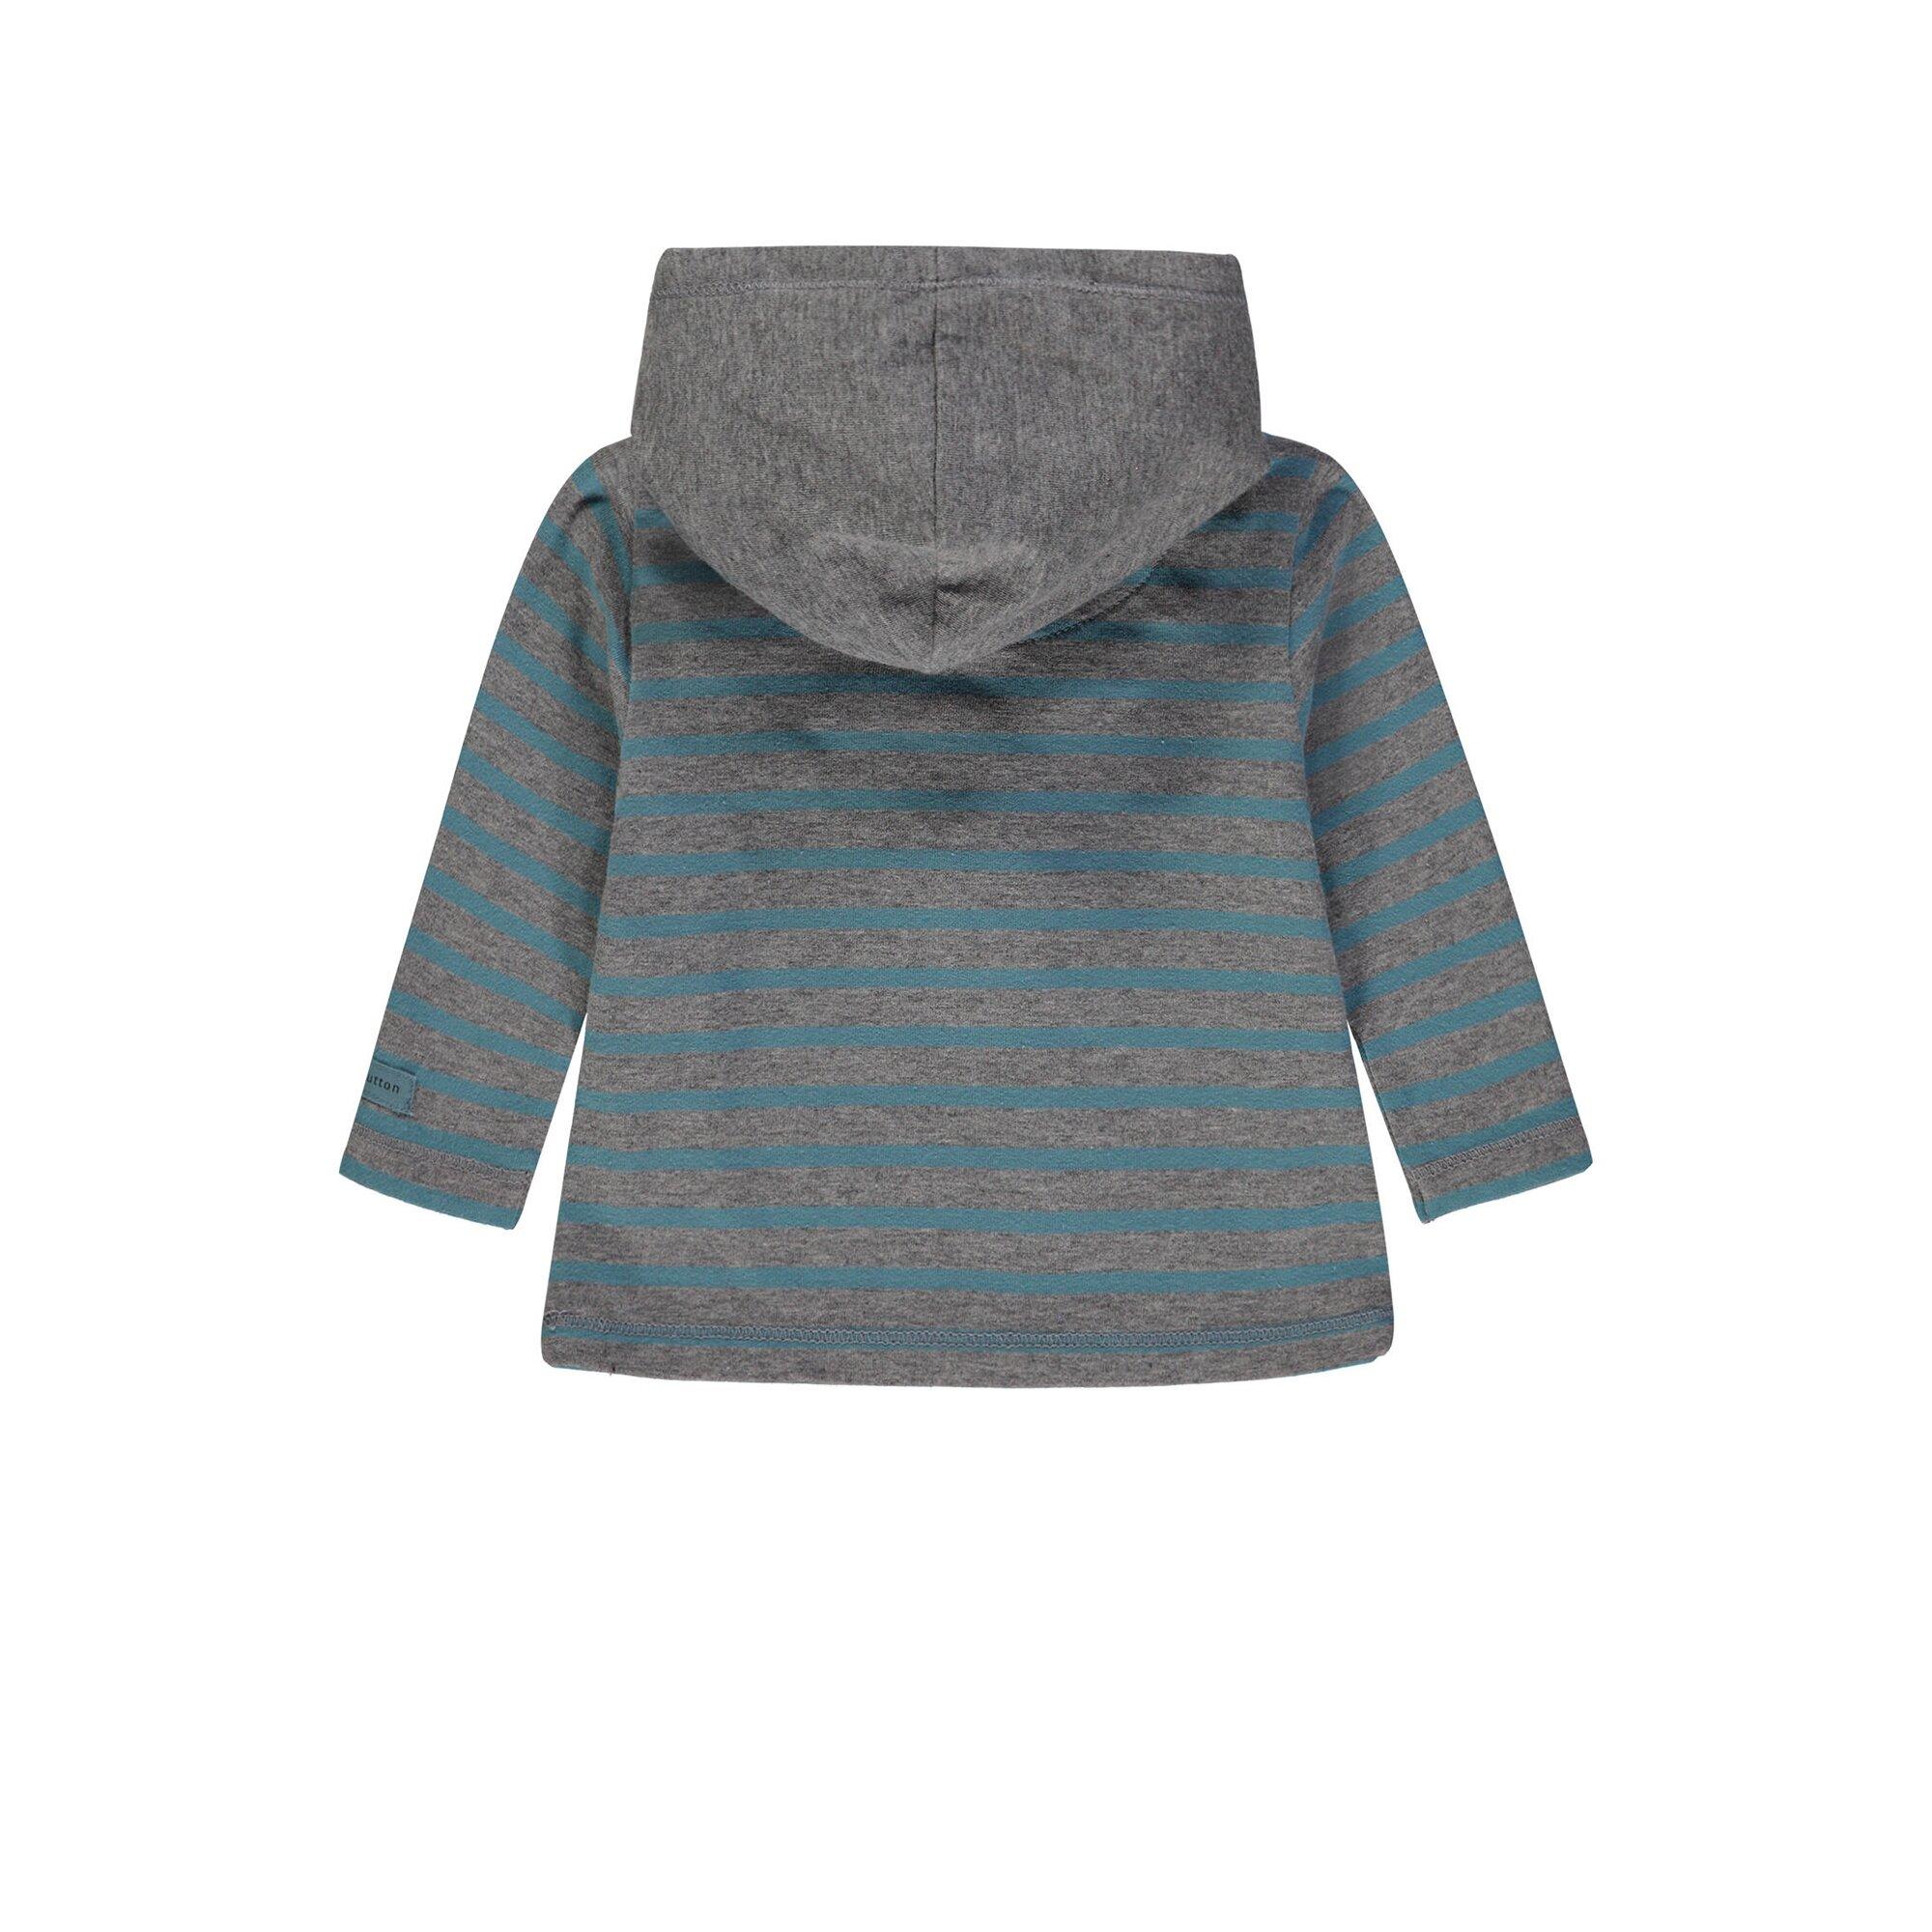 bellybutton-langarmshirt-mit-kapuze, 24.95 EUR @ babywalz-de